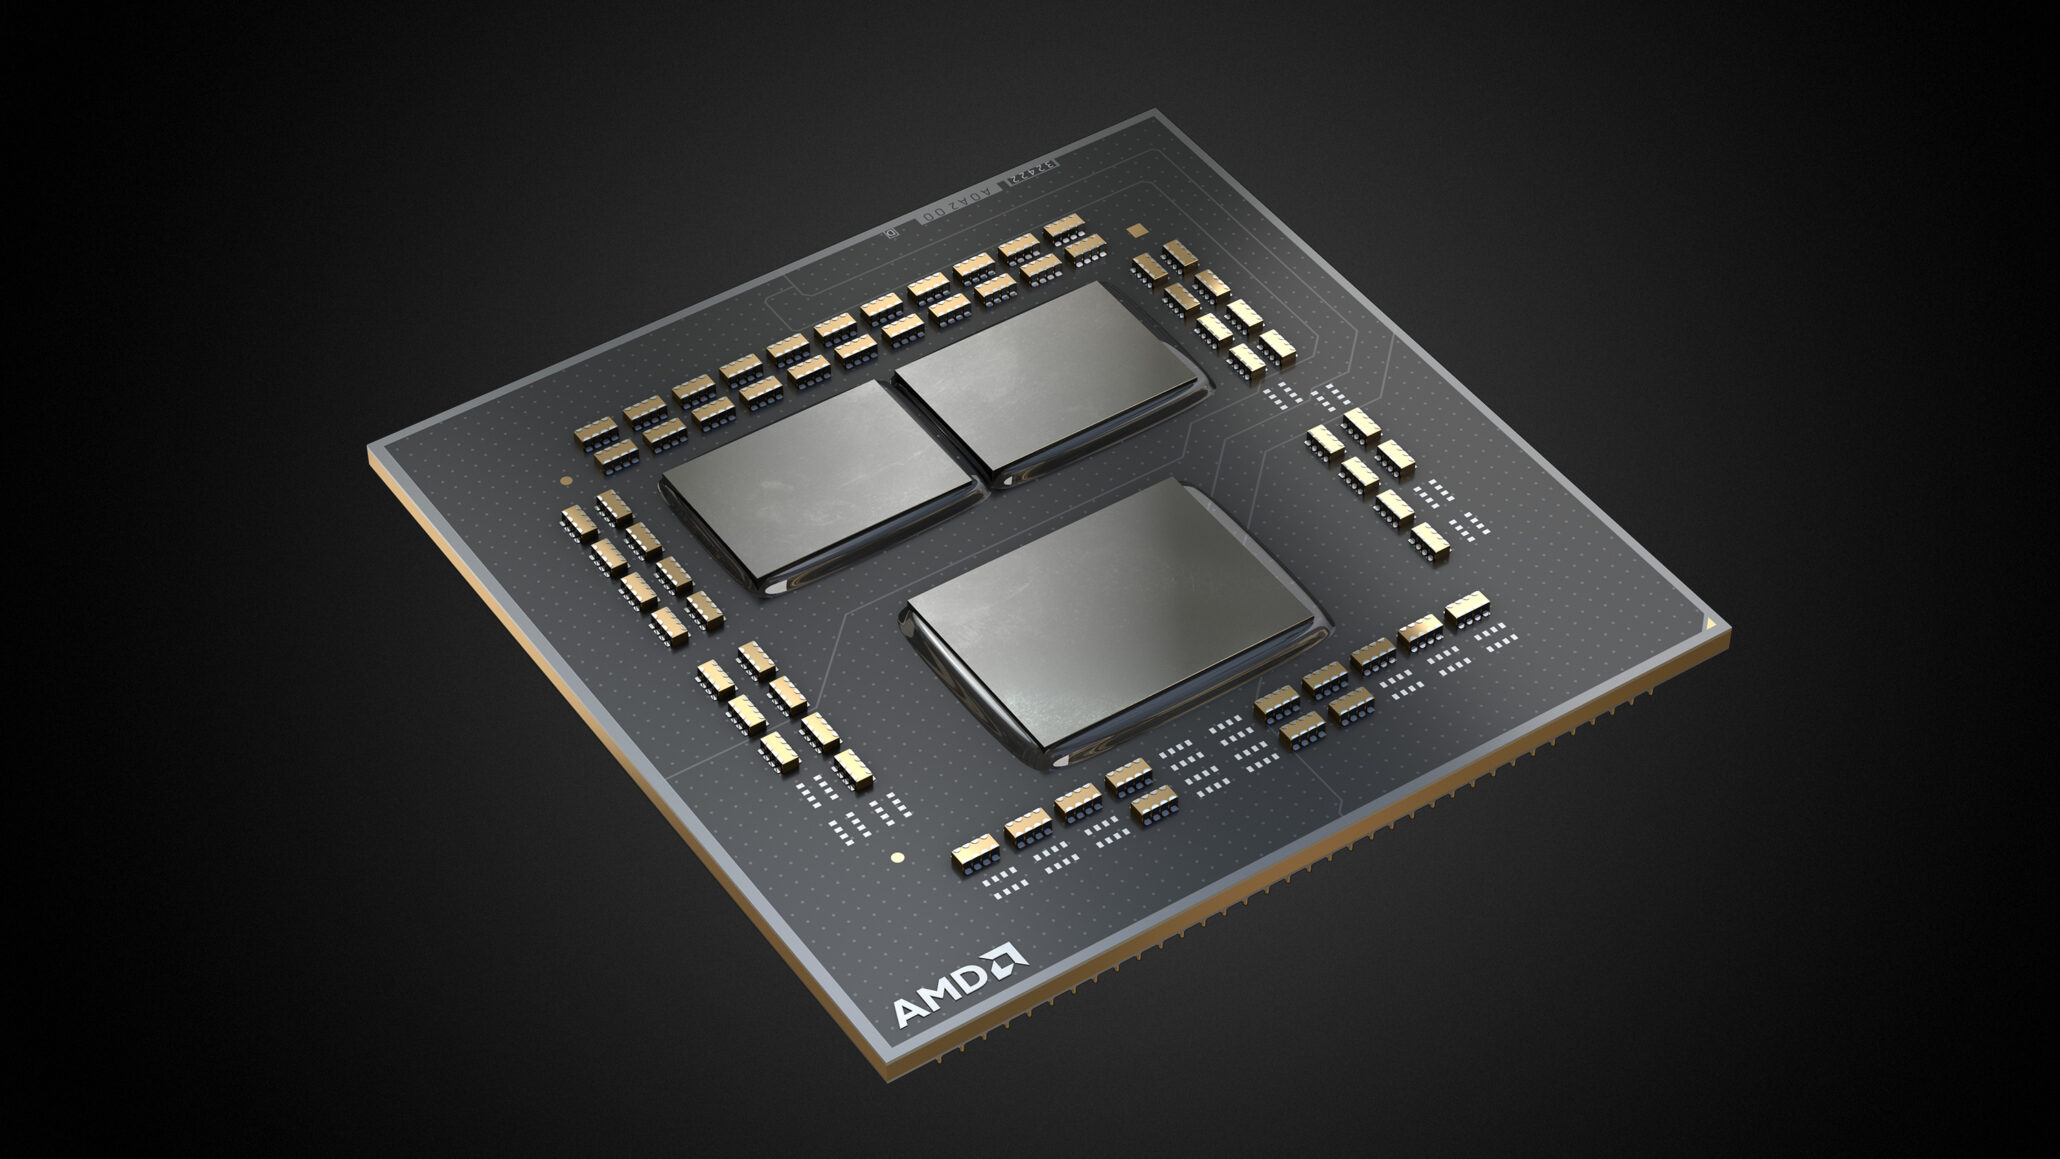 AMD AGESA 1.2.0.1 Patch A BIOS Firmware Mulai Dikeluarkan Untuk Motherboard X570 & B550